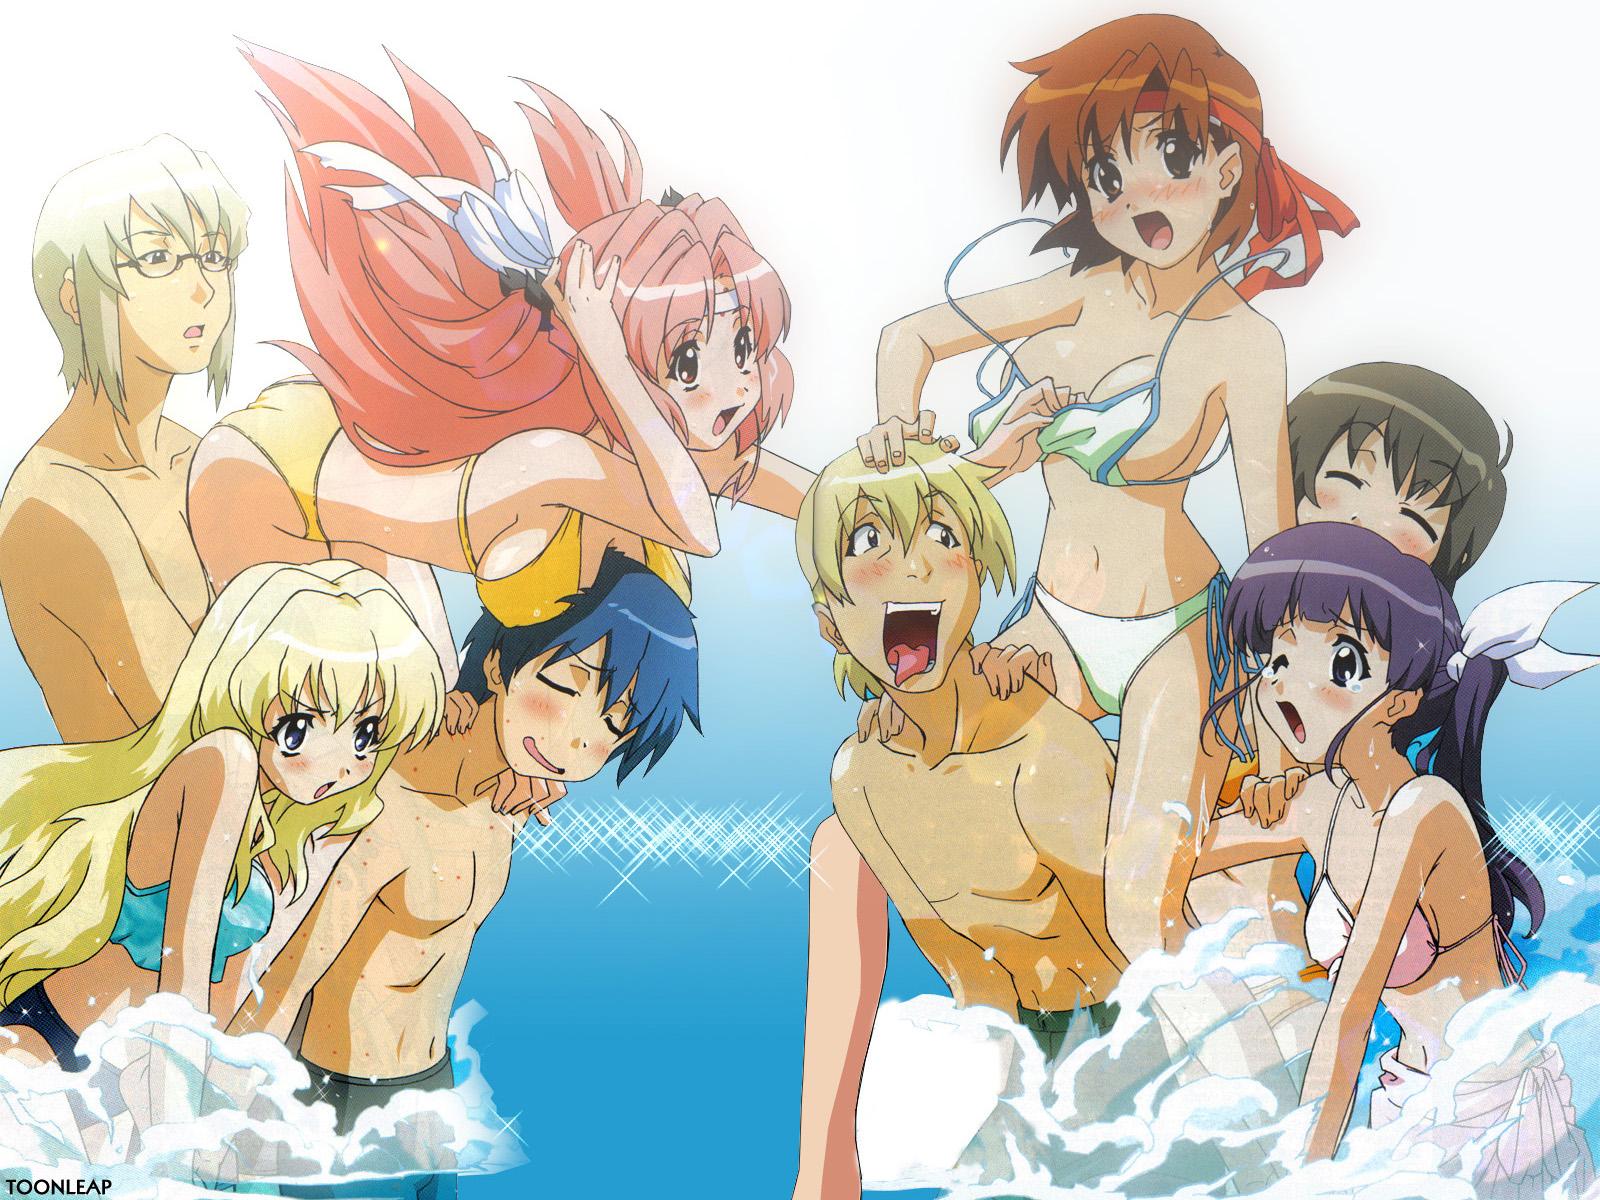 bikini fukuyama_kazuharu fukuyama_lisa girls_bravo kojima_kirie koyomi_hare_nanaka miharu_sena_kanaka sasaki_yukinari swimsuit